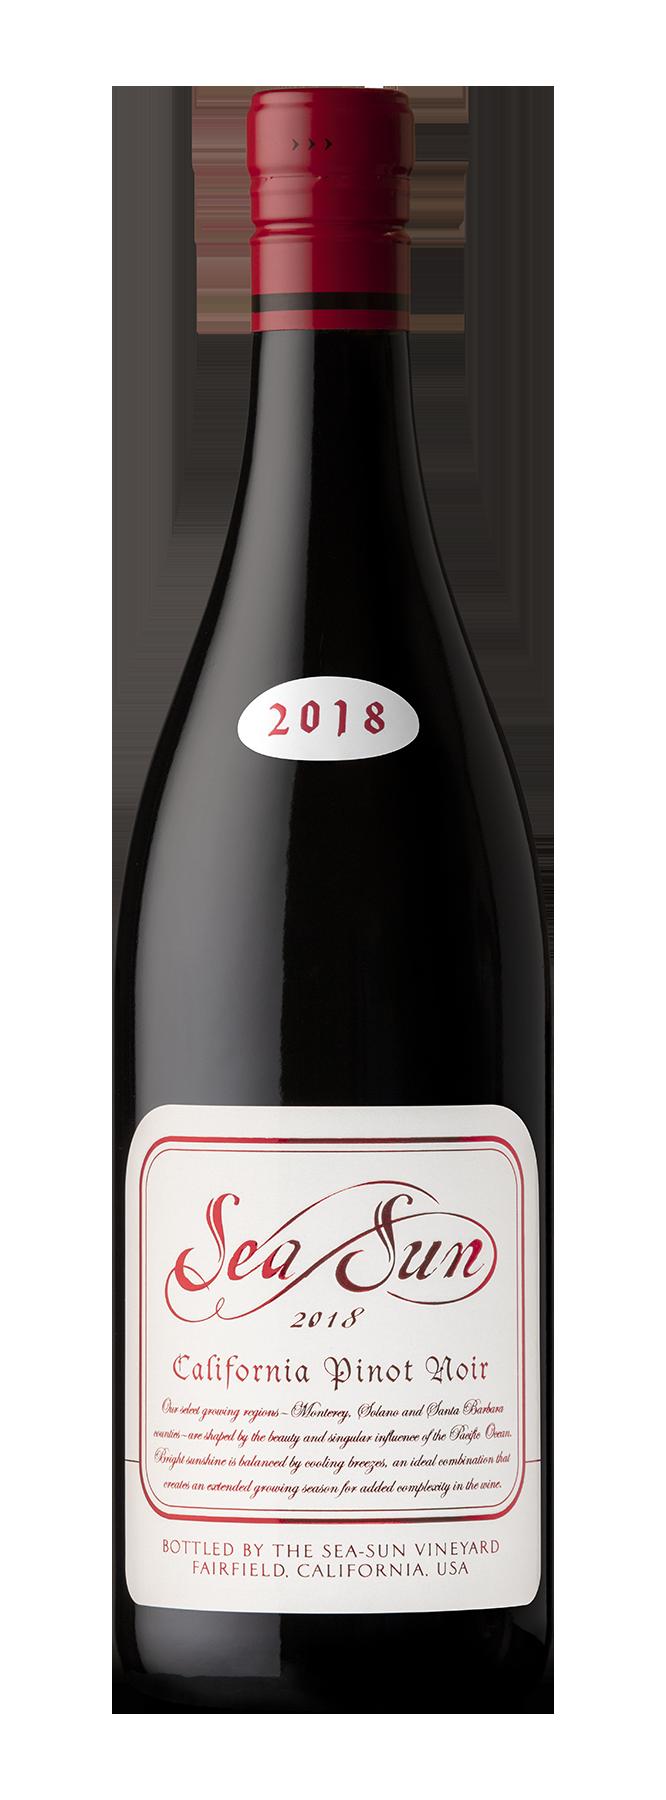 Sea Sun Pinot Noir – Vino tinto Pinot Noir 750ml.